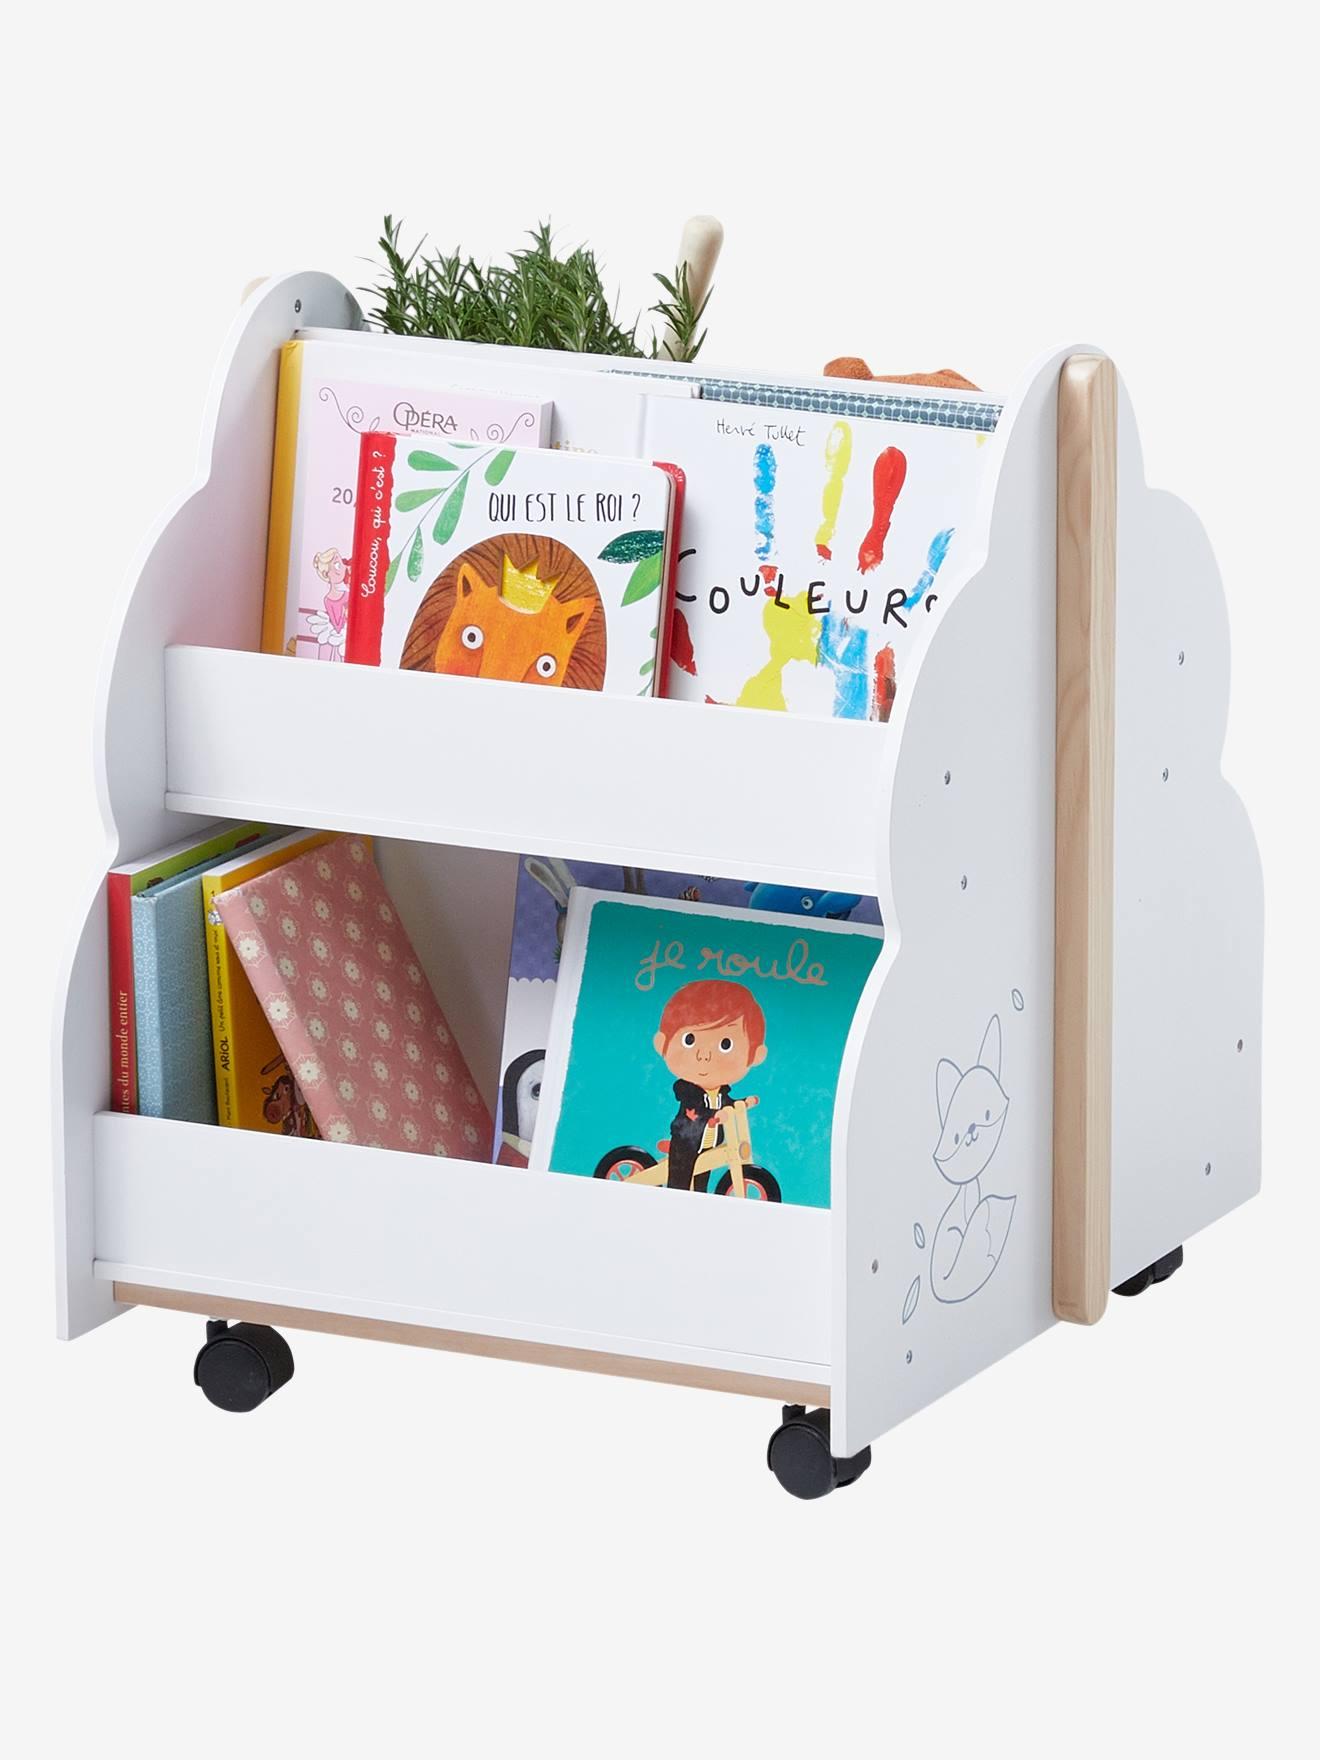 Full Size of Bücherregal Kinderzimmer Vertbaudet Bcherregal Sofa Regal Weiß Regale Kinderzimmer Bücherregal Kinderzimmer